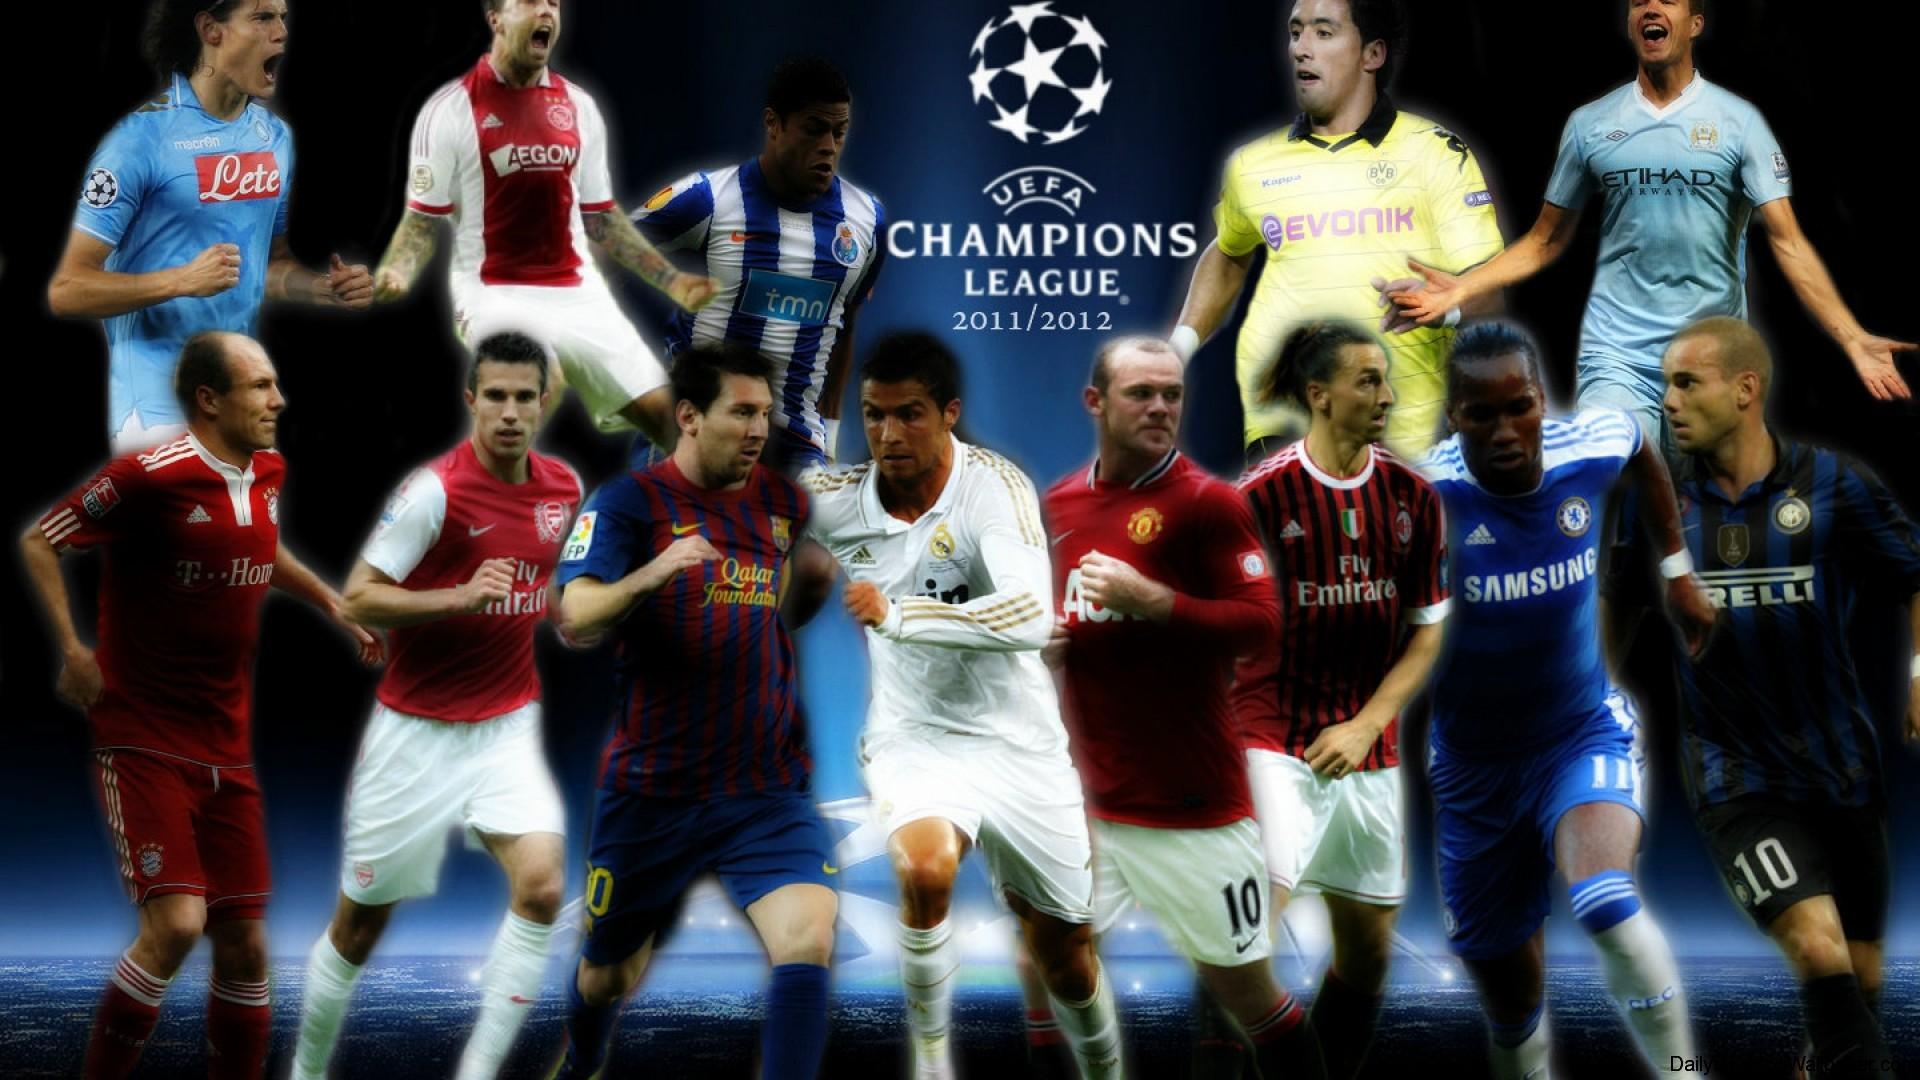 Download champions league wallpaper HD wallpaper 1920x1080